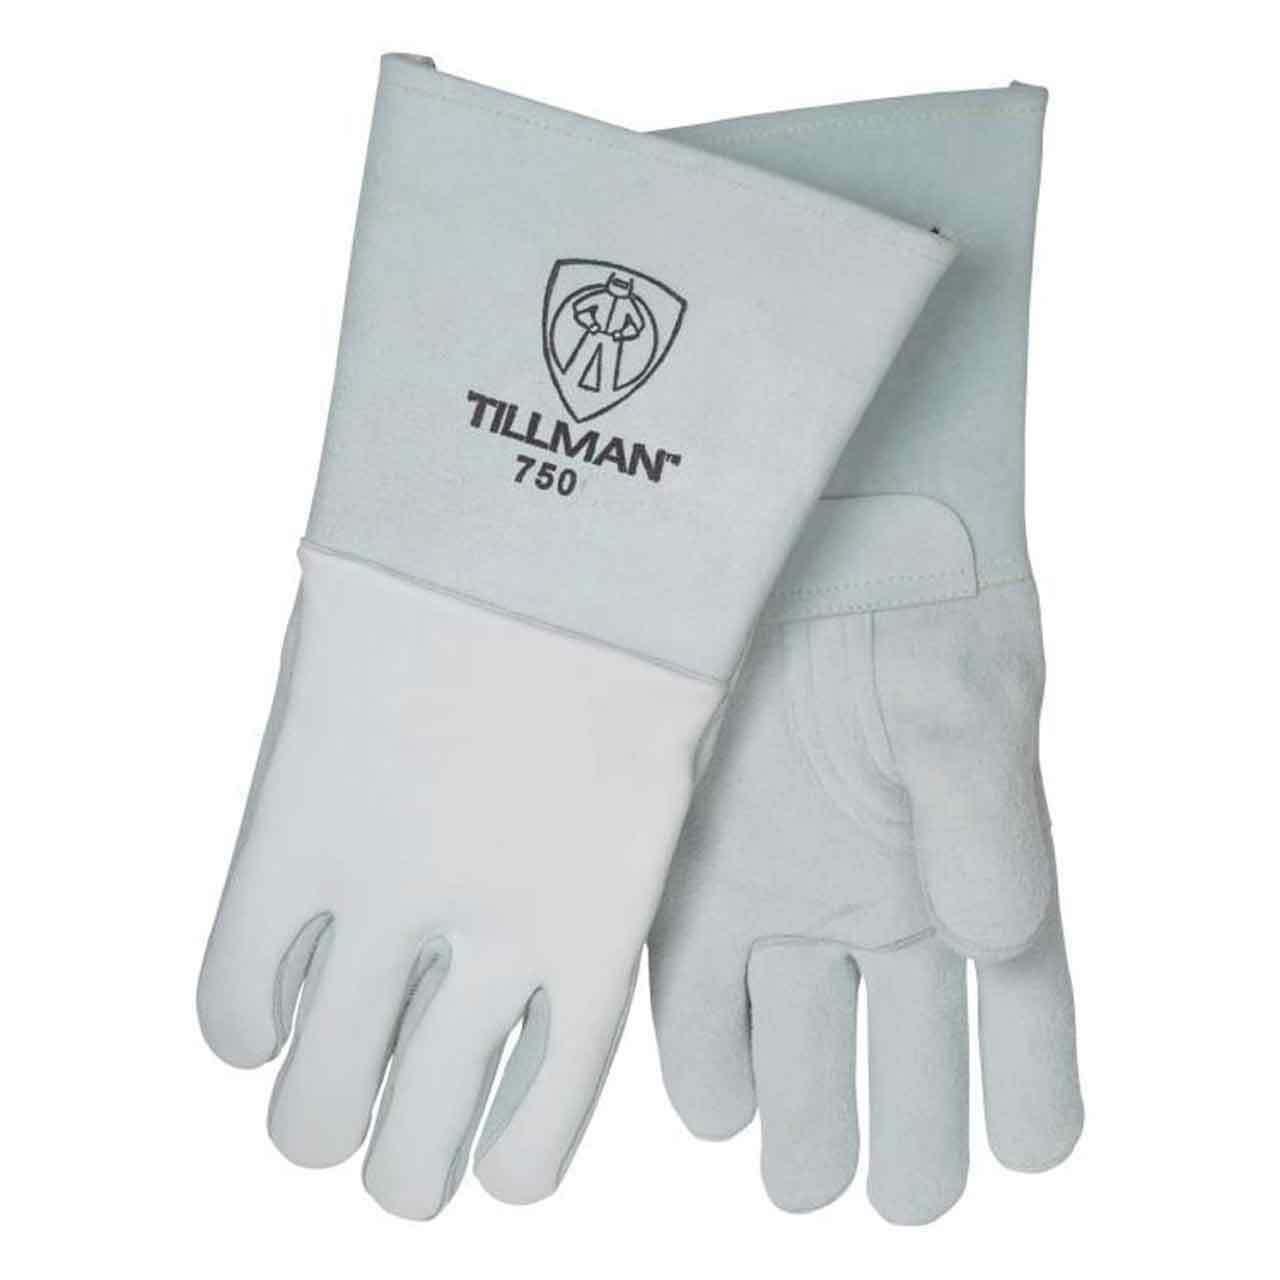 Tillman 750 Premium Top Grain Elkskin Welding Gloves Sizes Small-2XLarge Business & Industrial